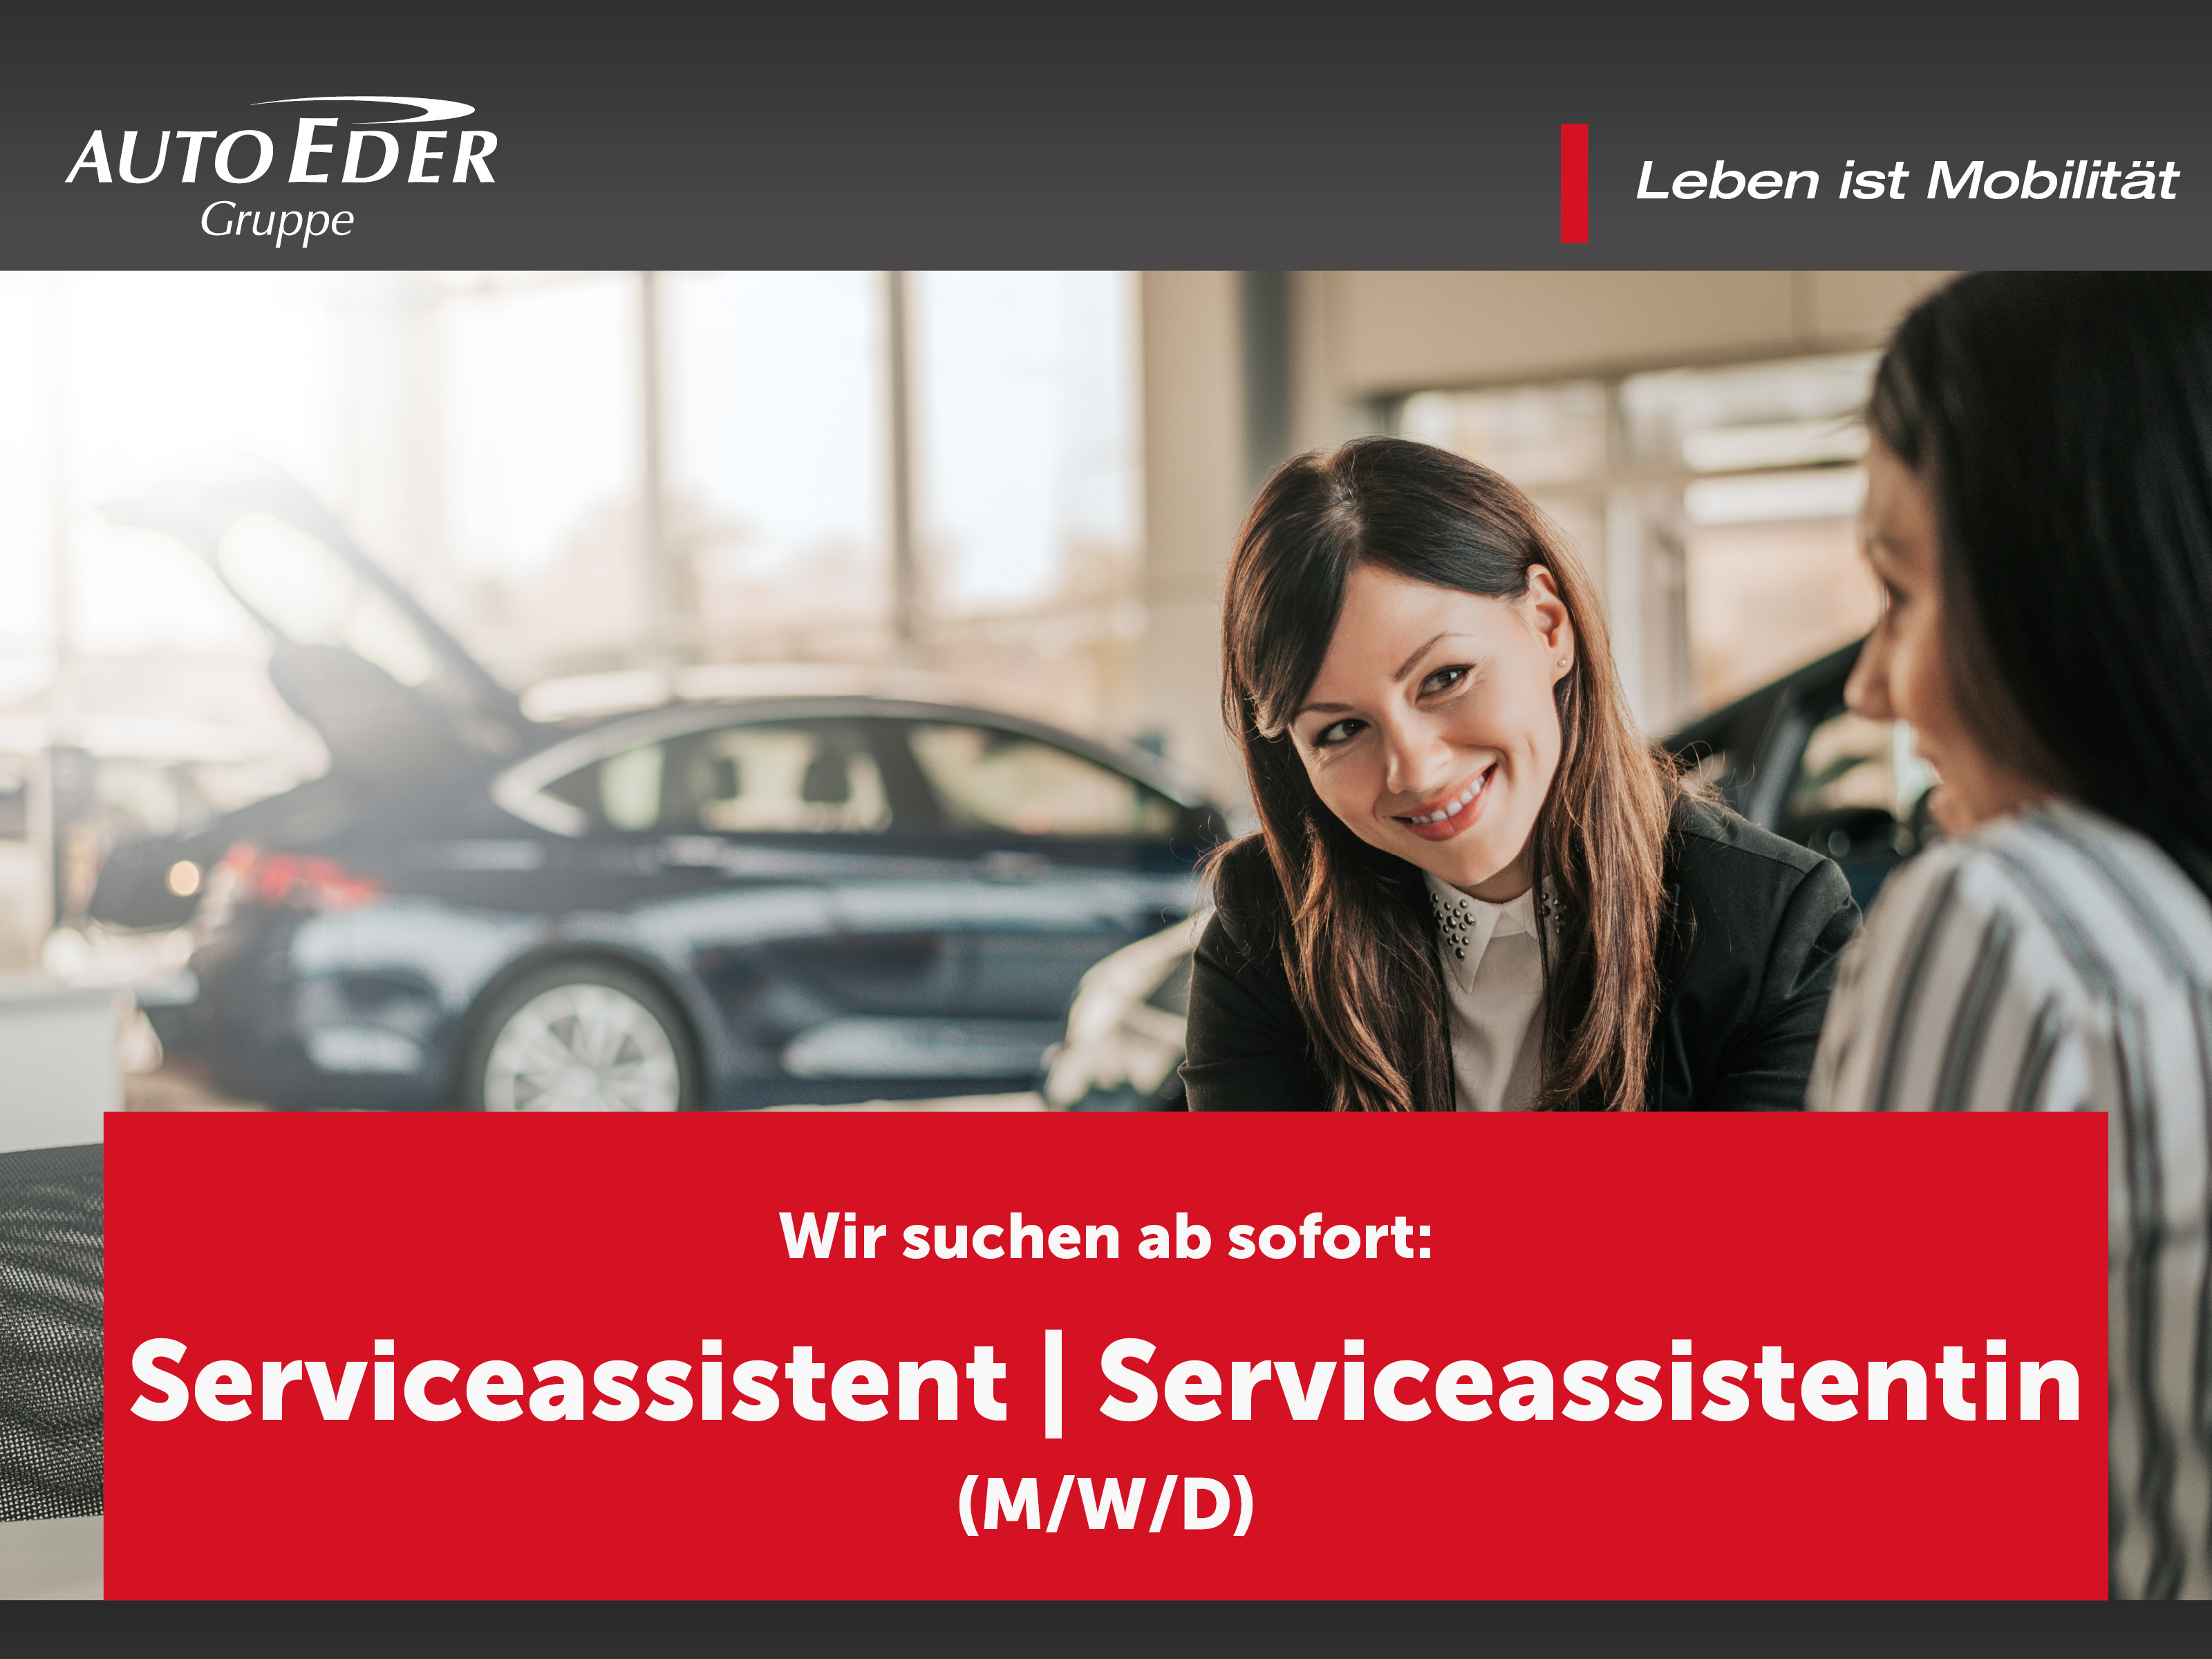 Serviceassistentin | Serviceassistent | Serviceassistenz (m/w/d)